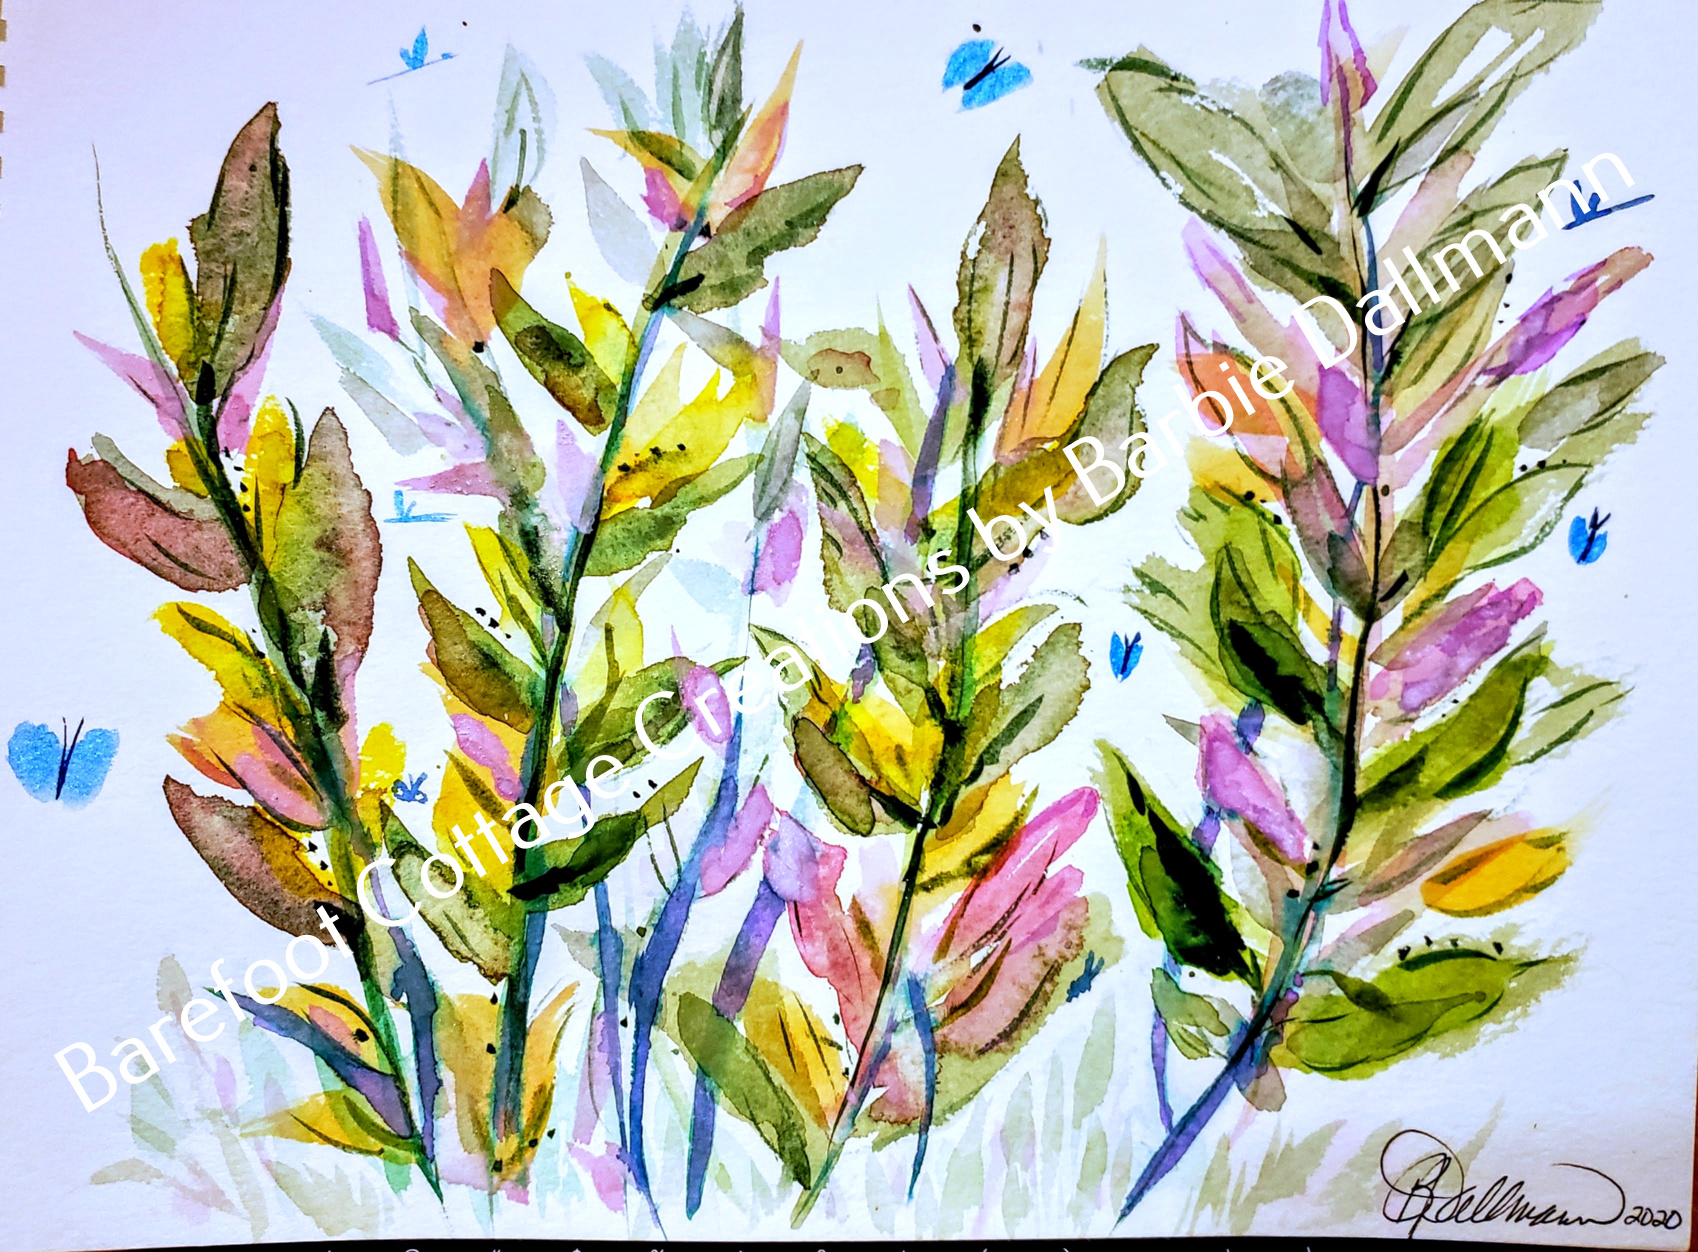 09 - Loose Florals